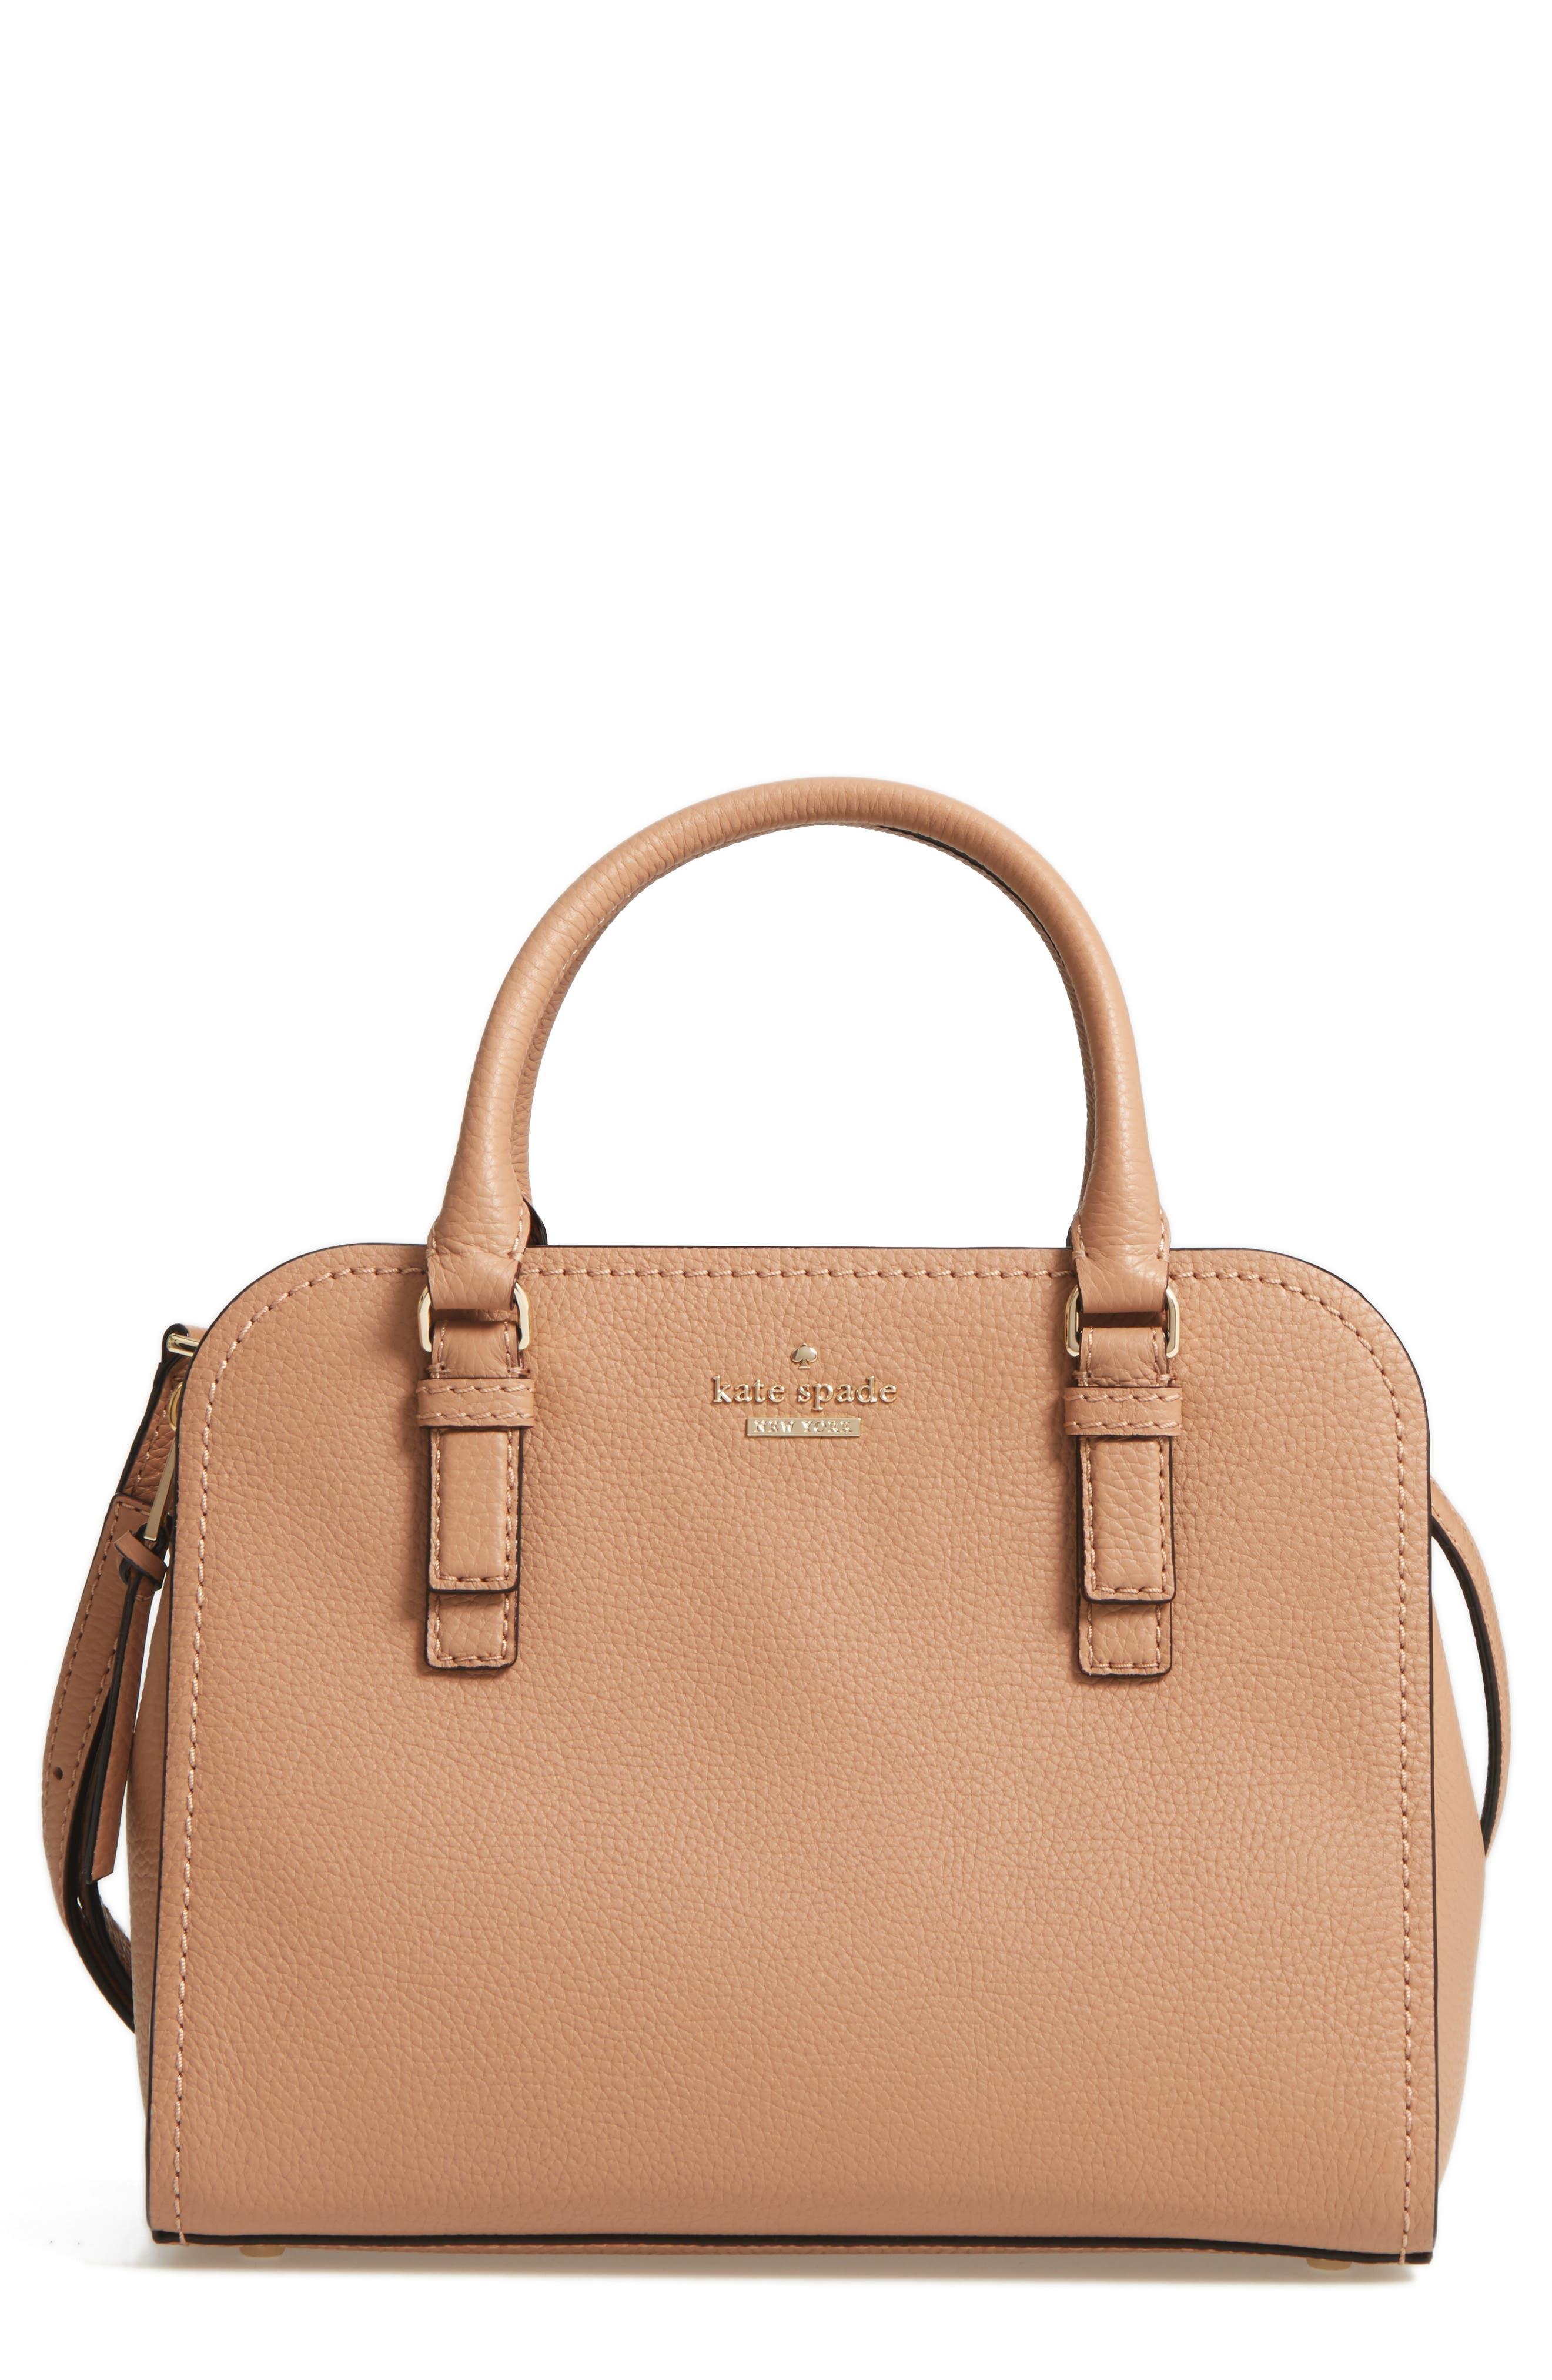 jackson street small kiernan leather top handle satchel,                         Main,                         color, Hazel